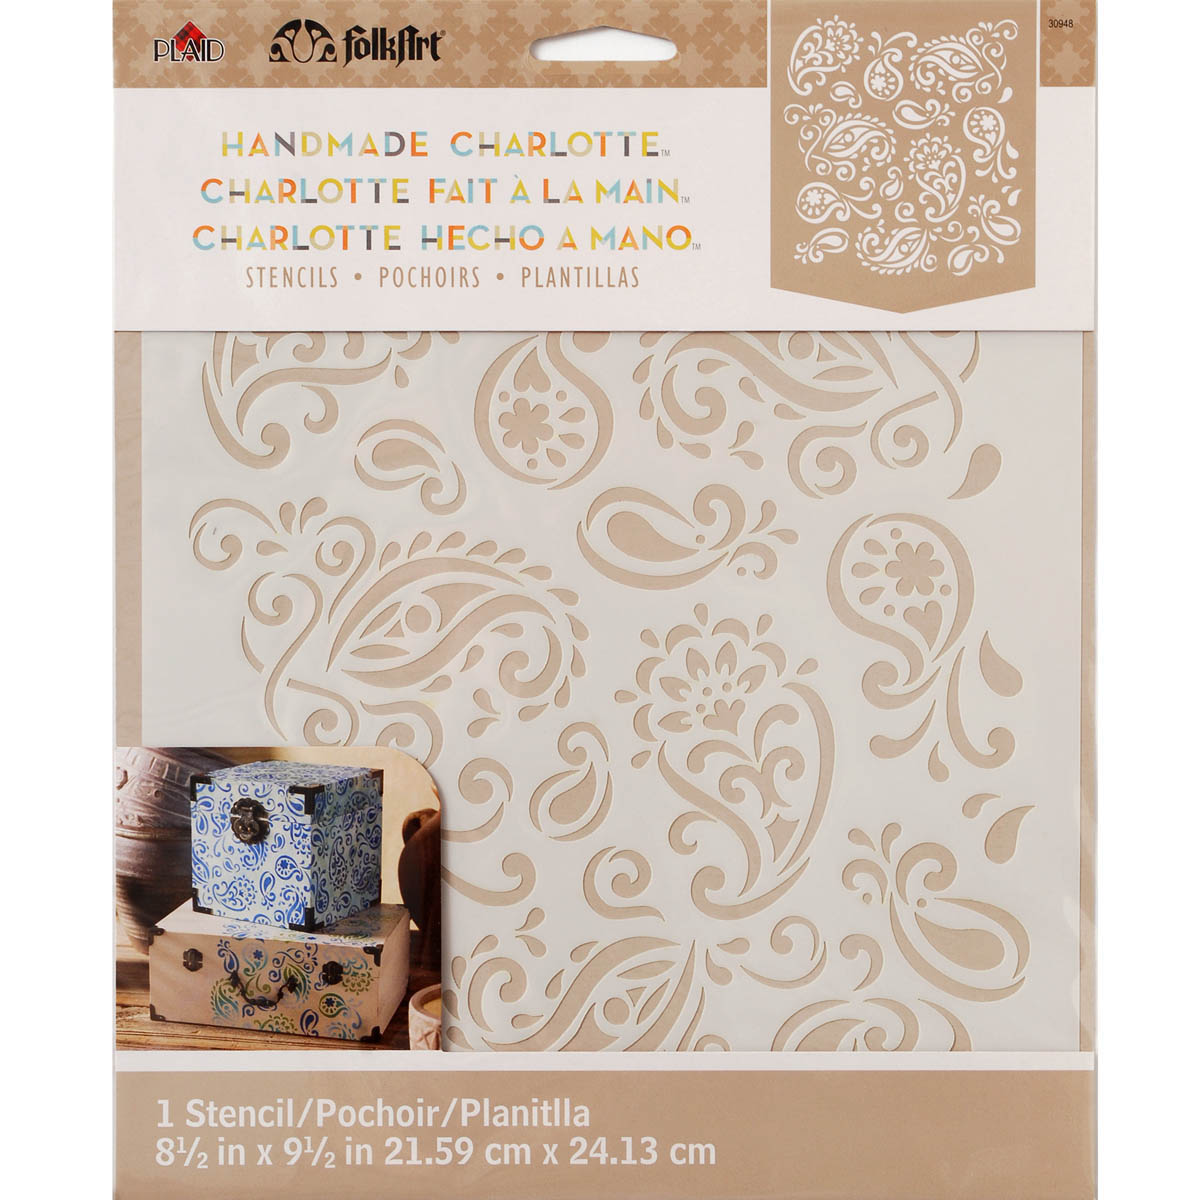 FolkArt ® Handmade Charlotte™ Stencils - Paisley Delight - 30948